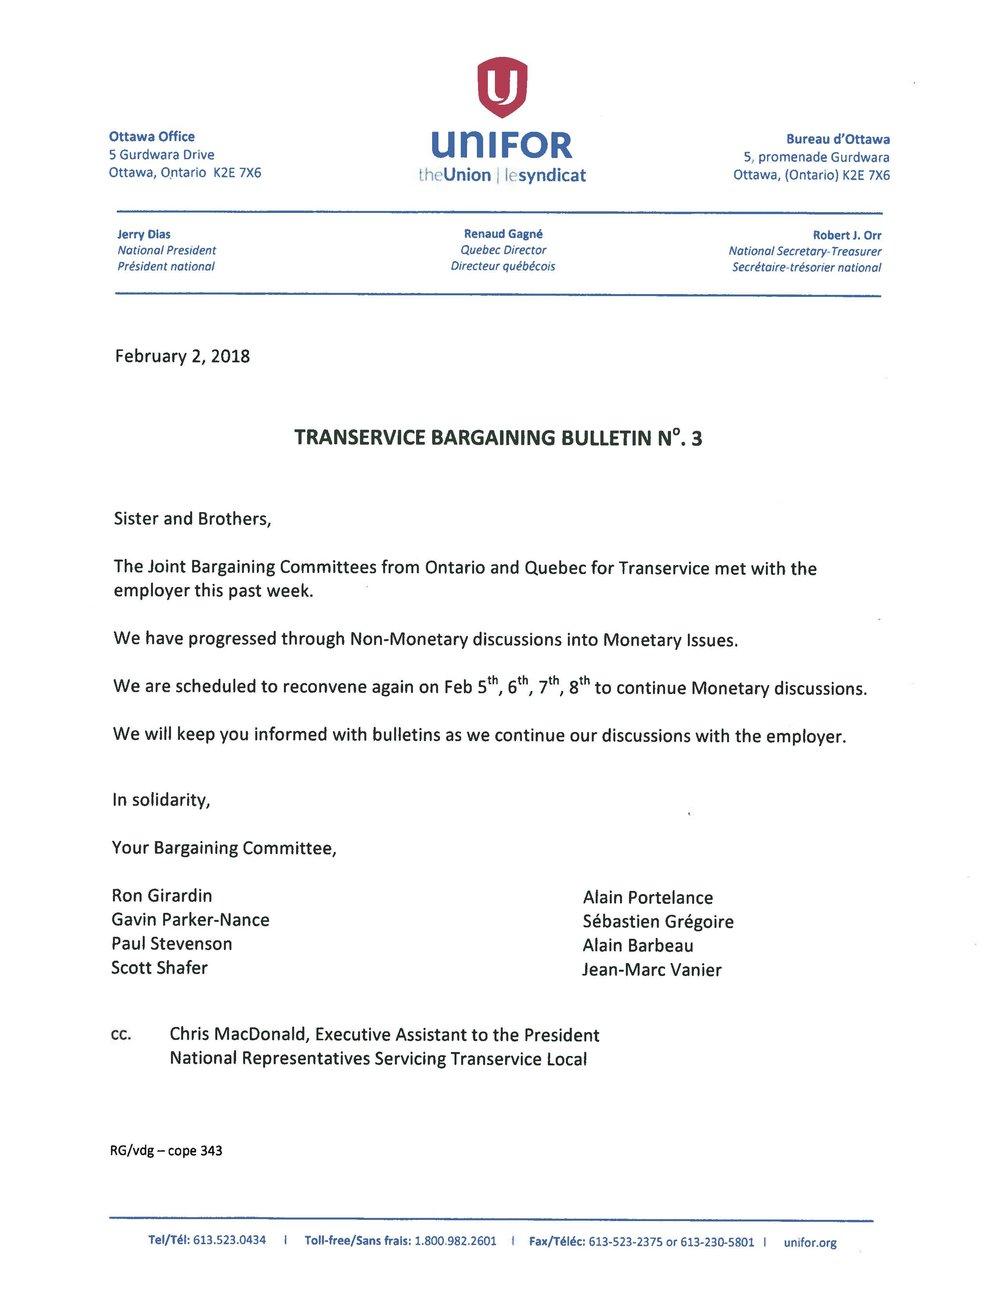 Transervice Bargaining - Bulletin - 03 - 2018-02-02.jpg